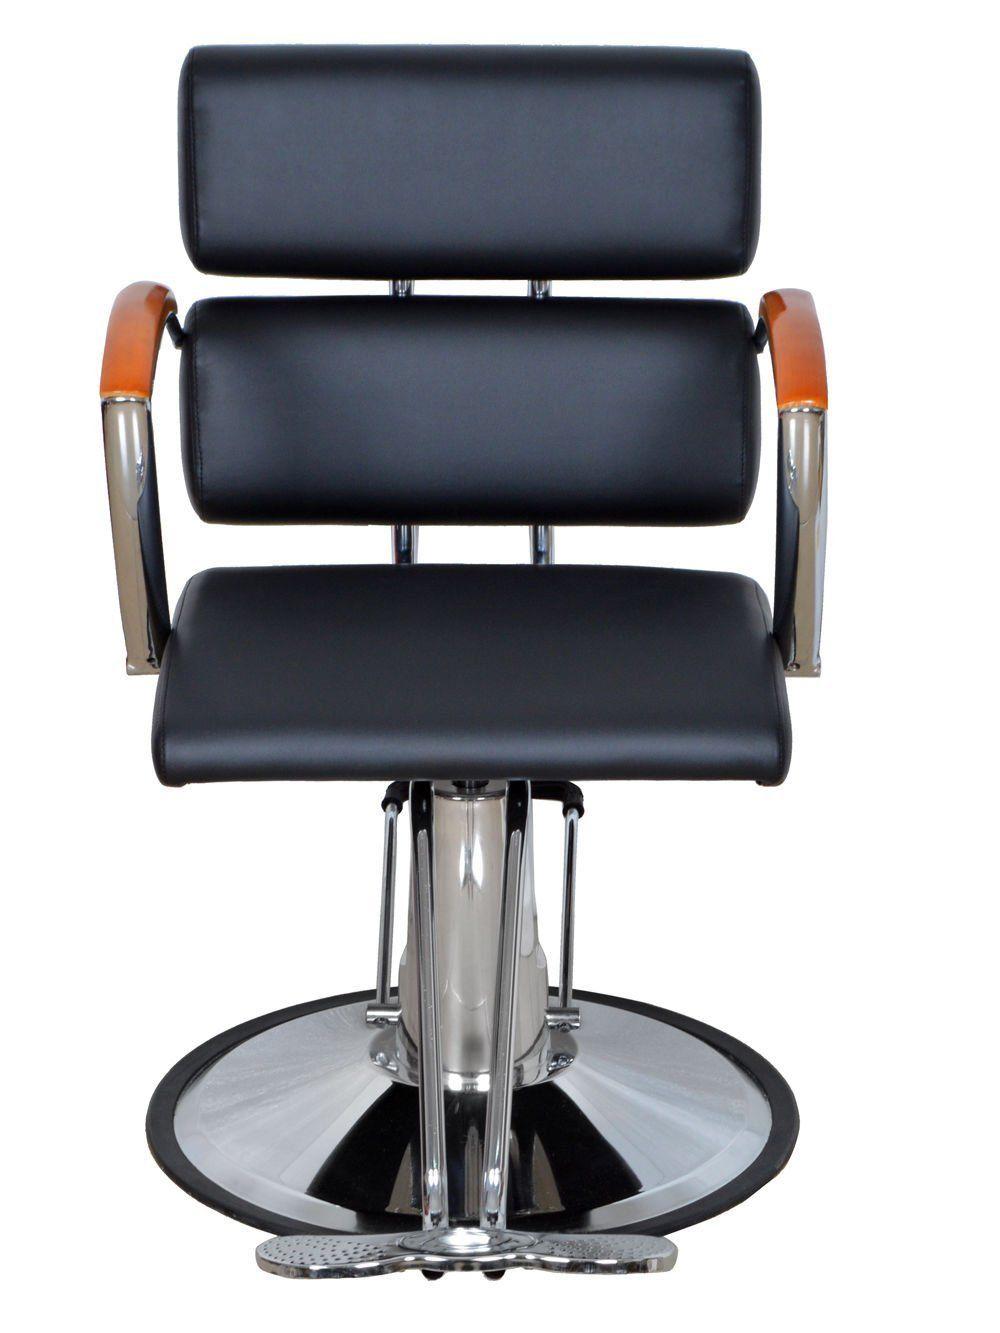 Hydraulic Adjustable Barber Chair Hair Styling Salon